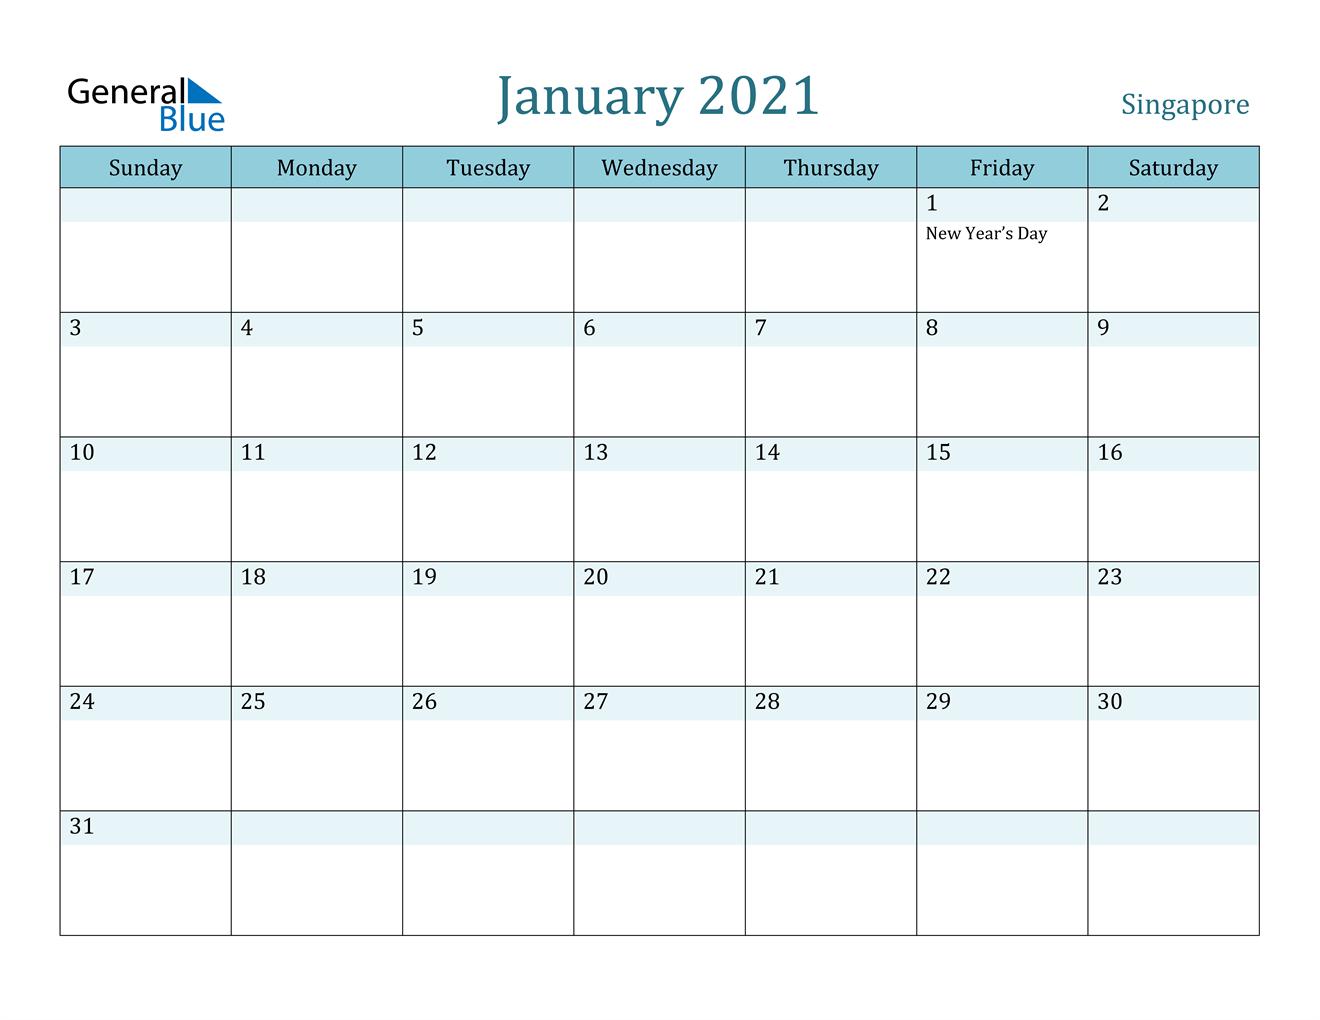 January 2021 Calendar - Singapore